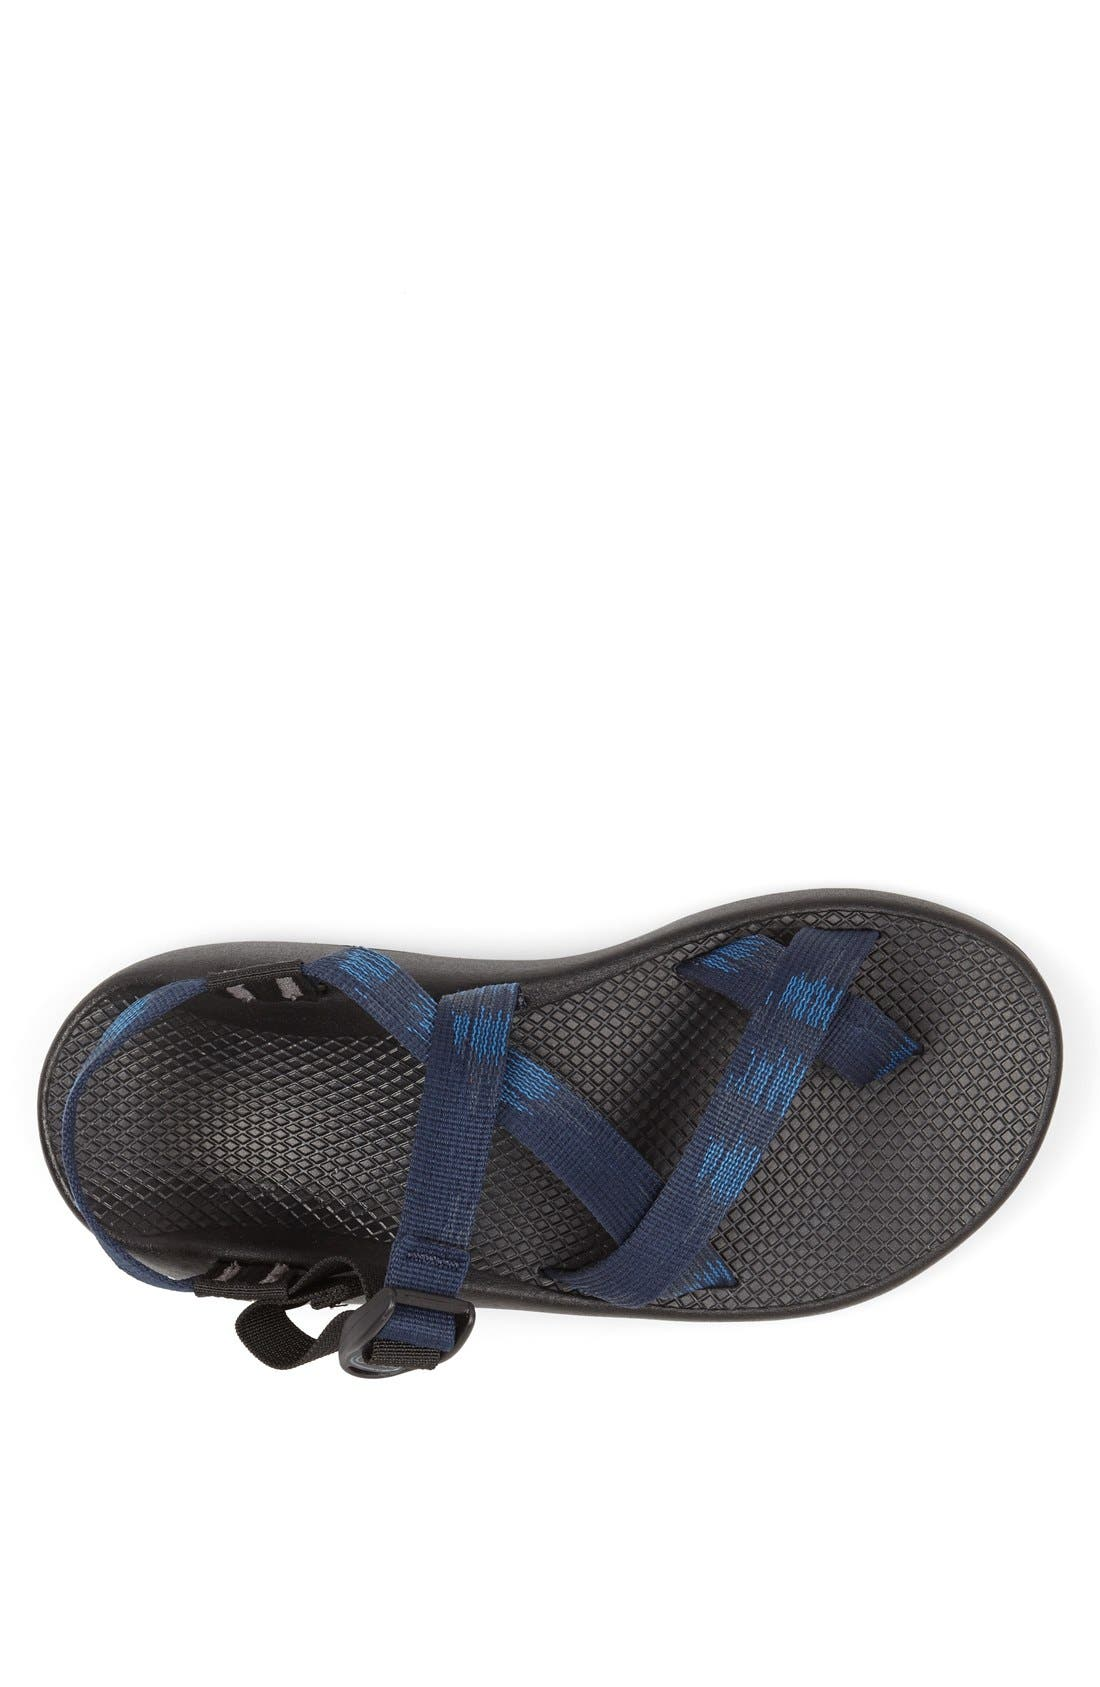 Alternate Image 3  - Chaco 'Z/2 Yampa' Sandal